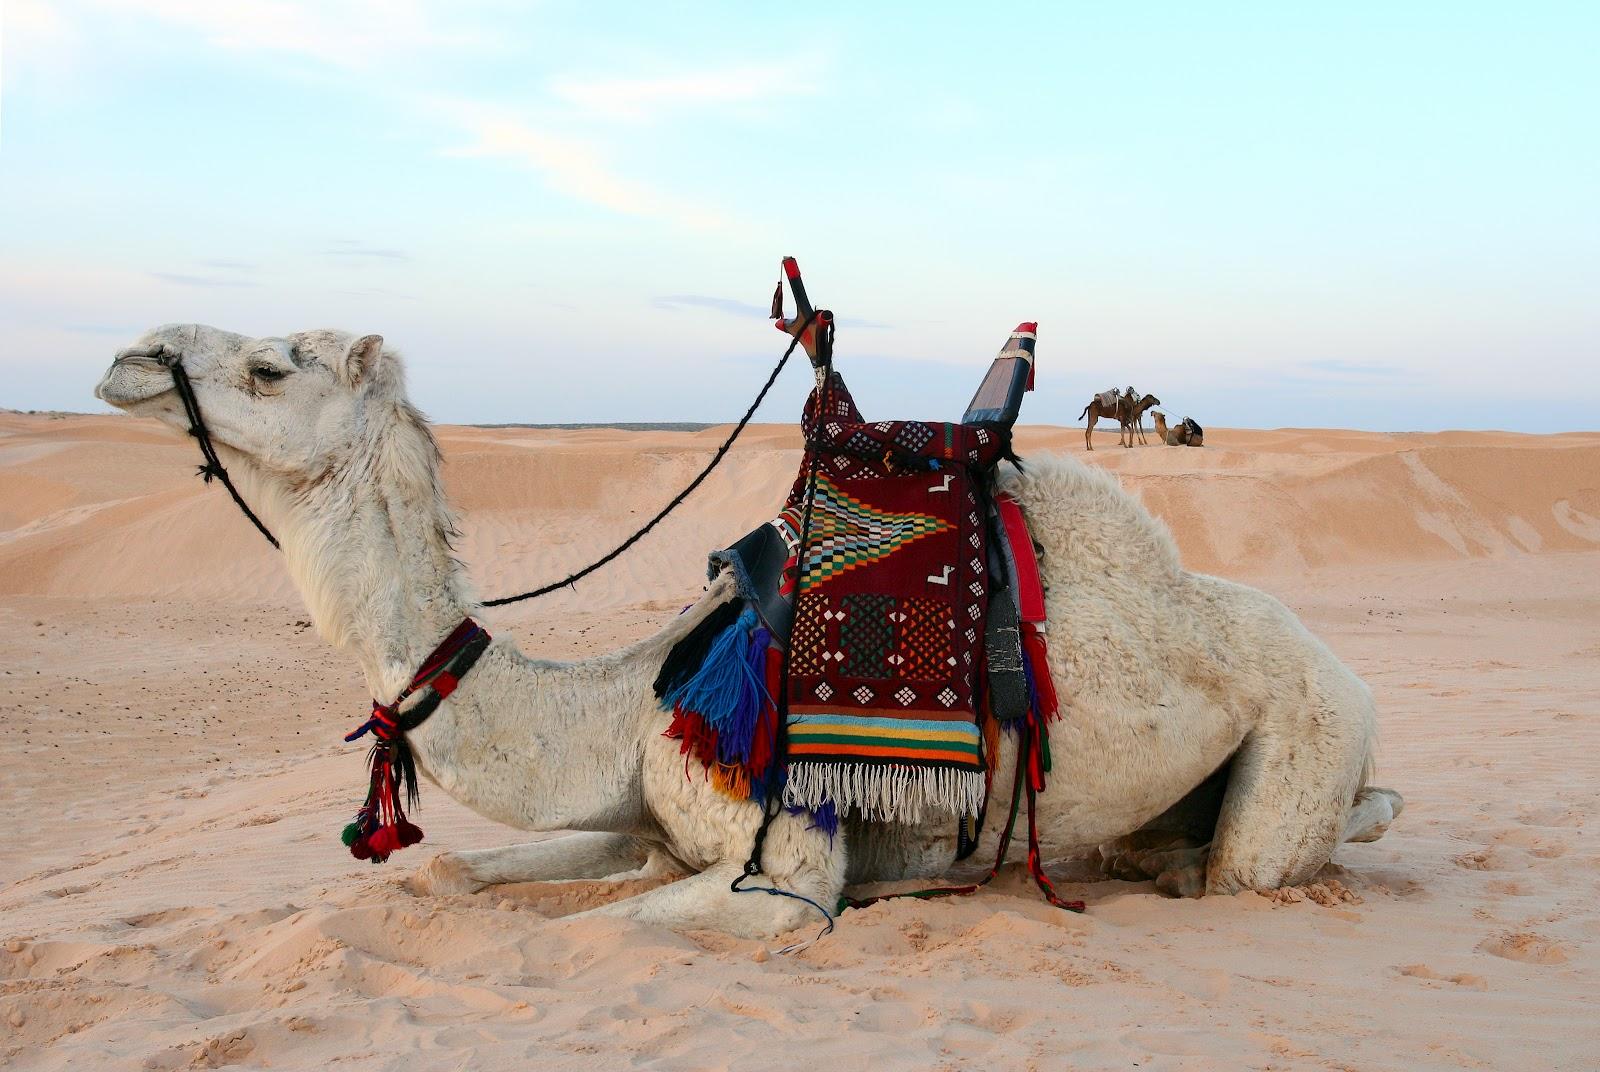 http://4.bp.blogspot.com/-zQ92ubb8a3Y/T3G4PxSG39I/AAAAAAAAEGw/V8In6CxQlA4/s1600/camels+1.jpg